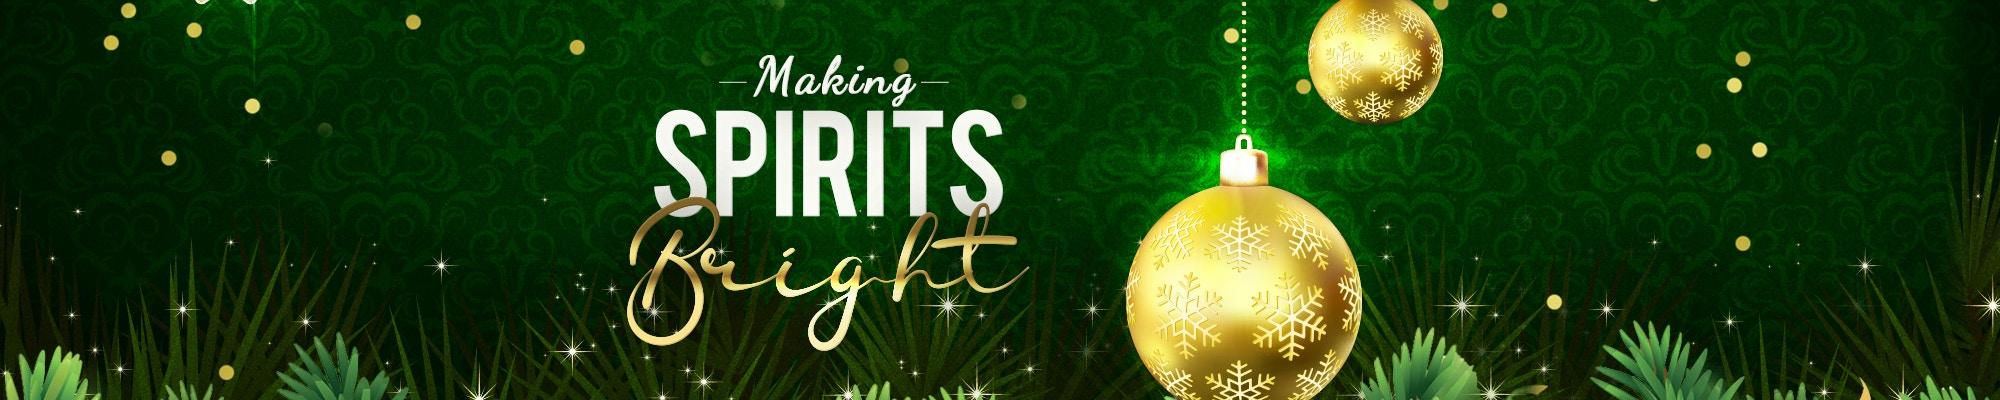 Christmas Events Houston 2020 Making Spirits Bright   Unity of Houston's 2020 Christmas Concert